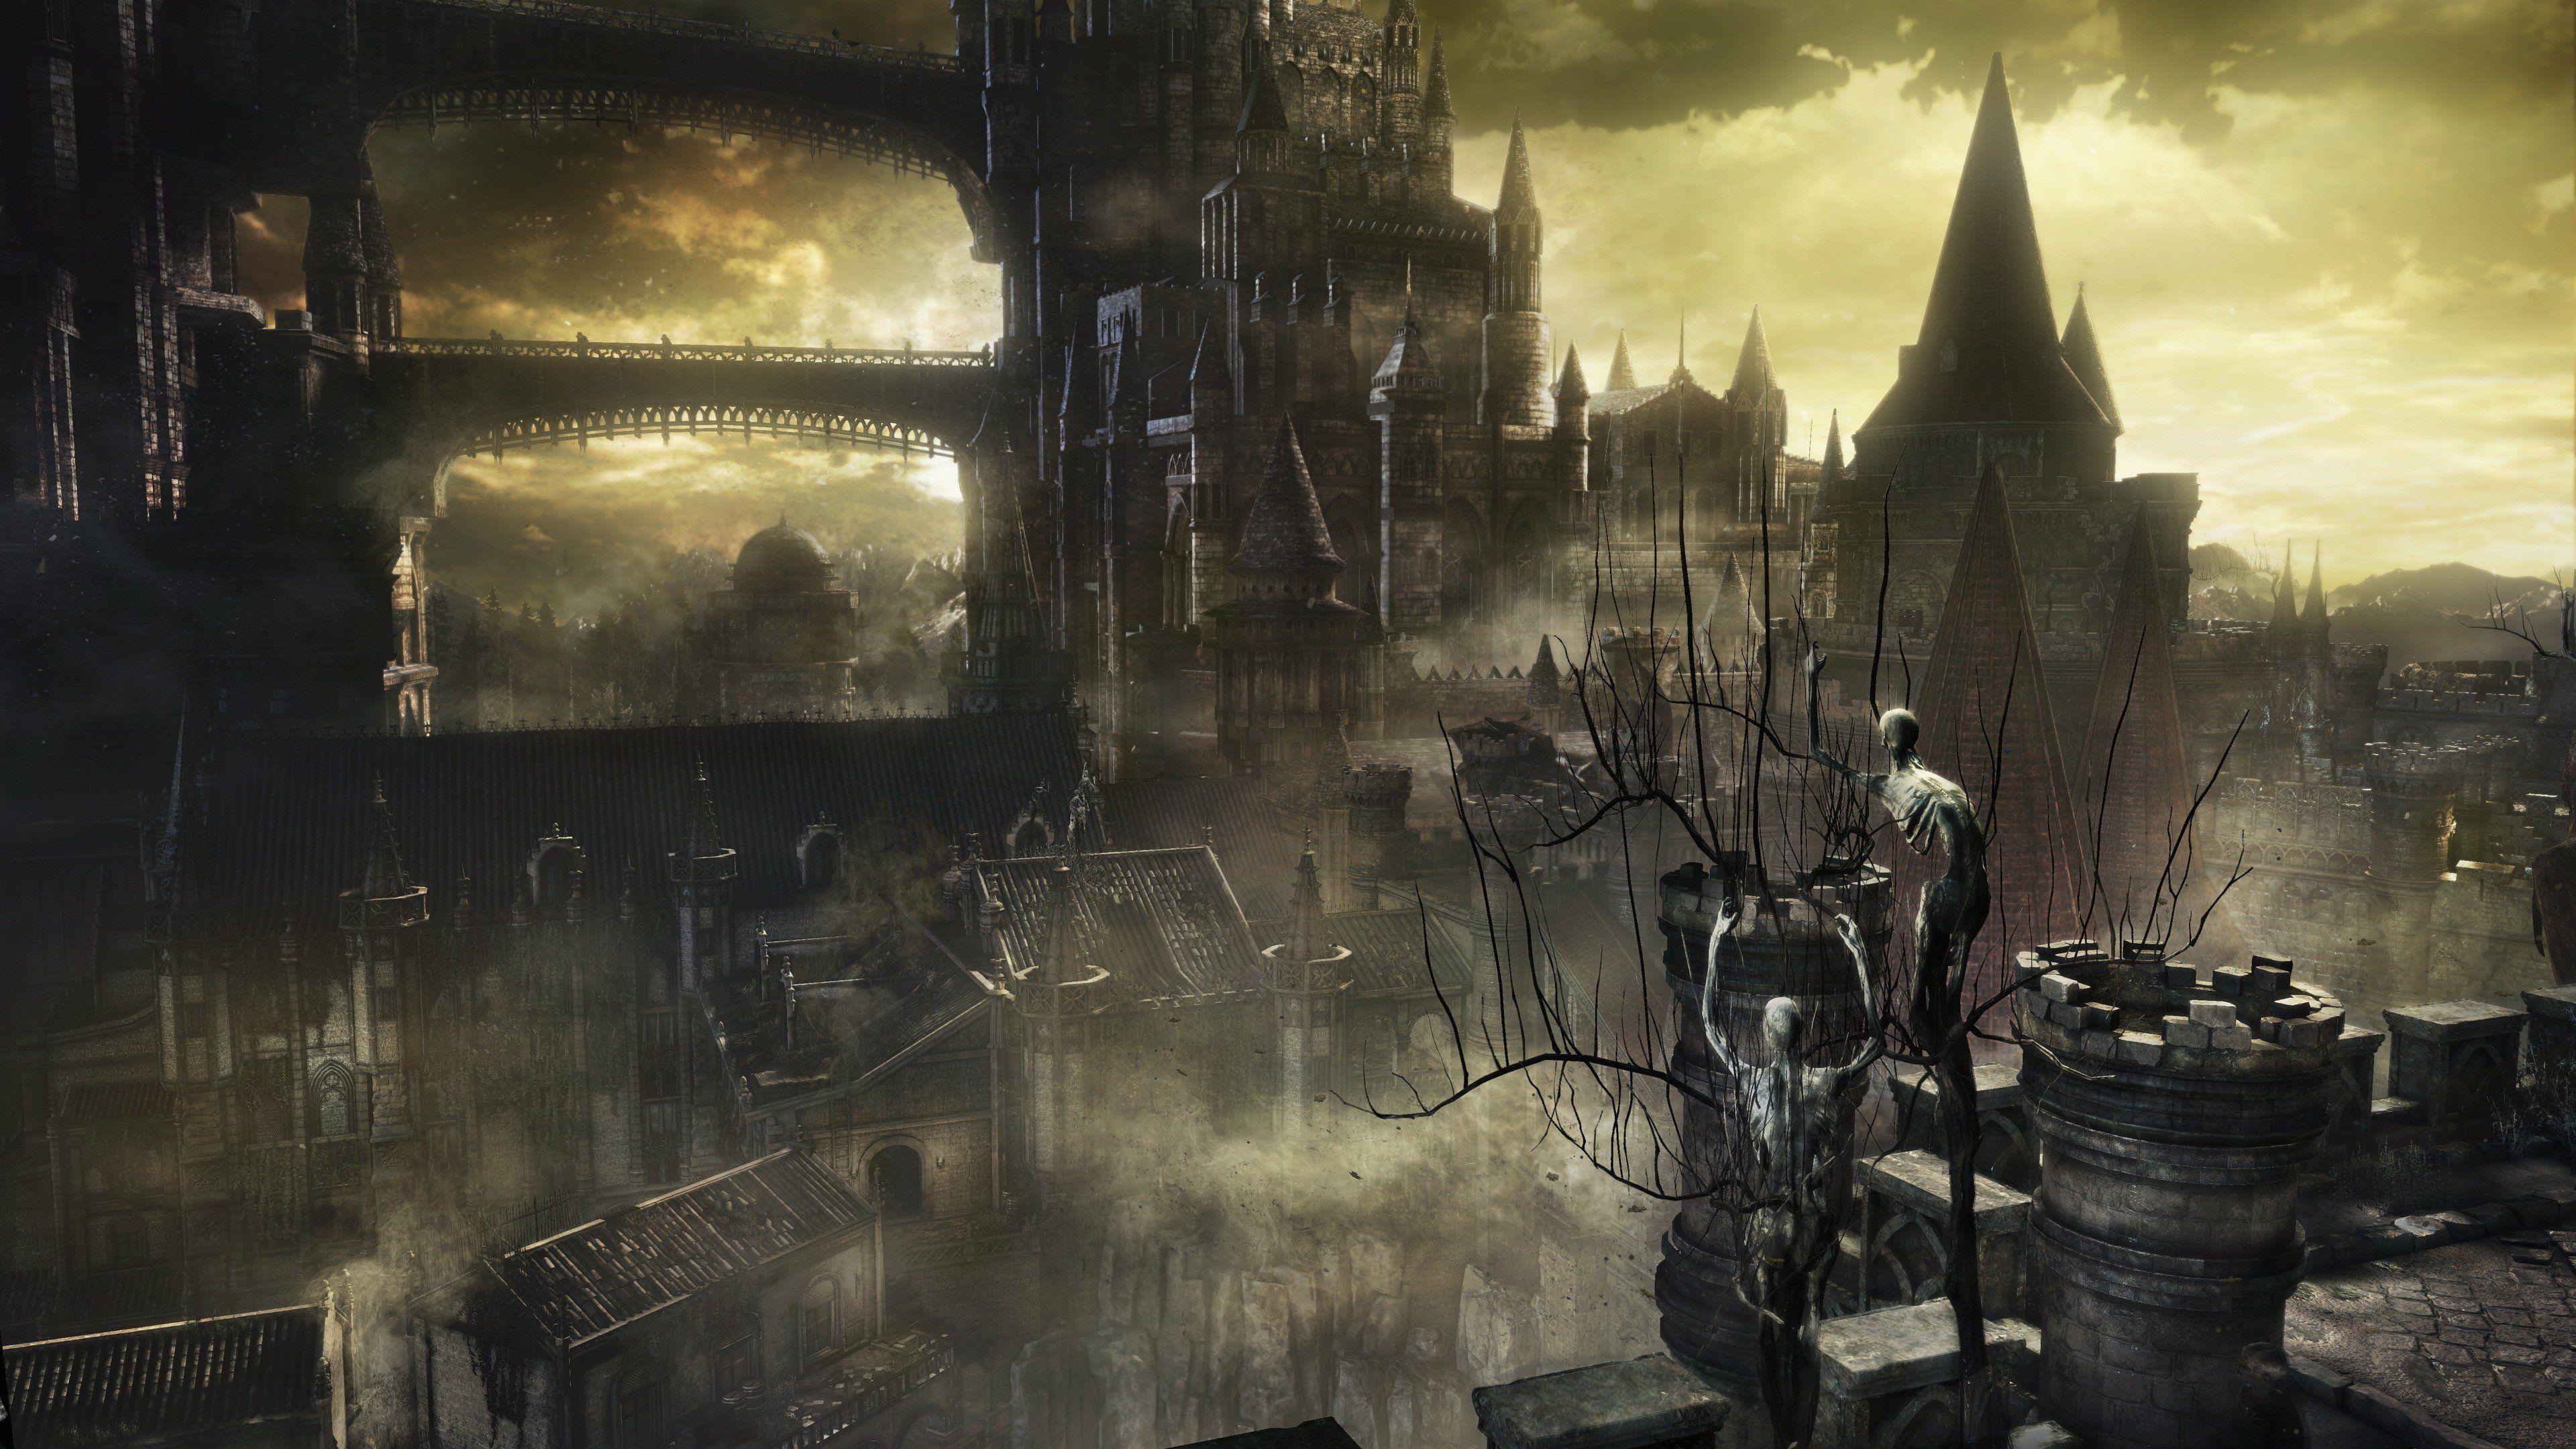 Dark Souls 3 Wallpapers Wallpaper Cave